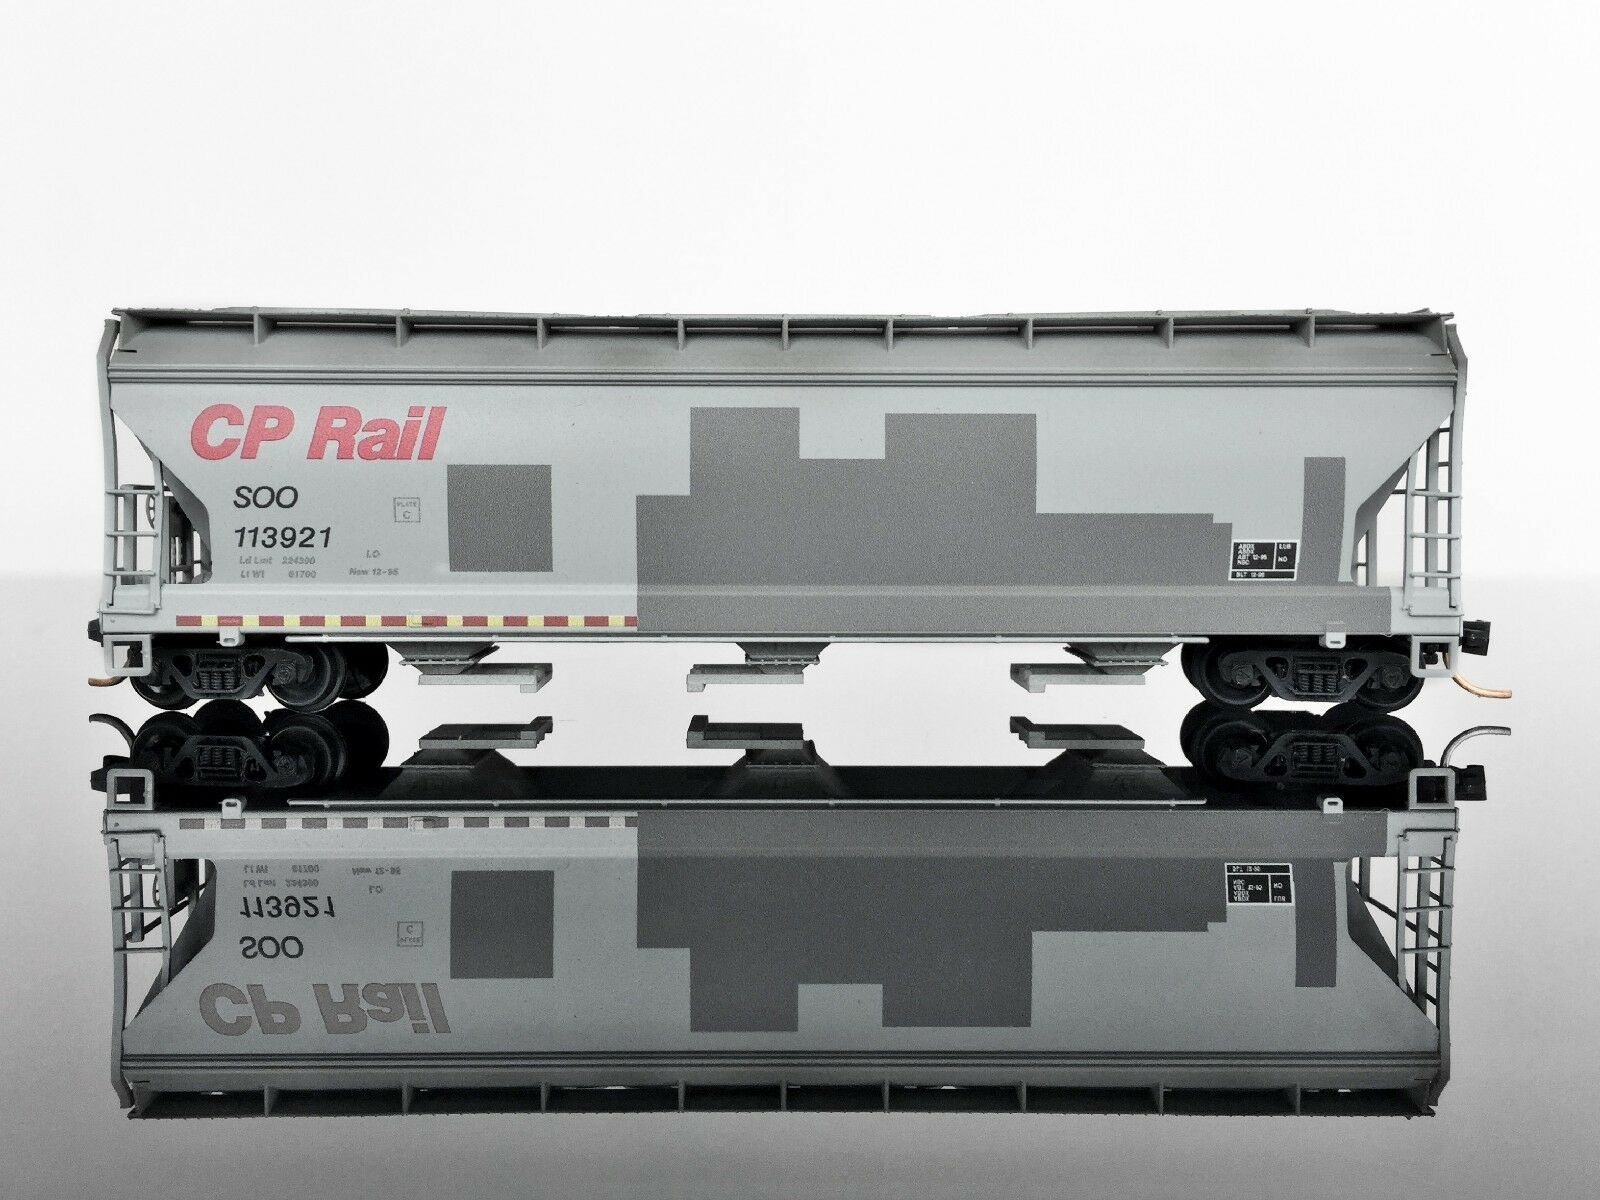 MTL Micro-Trains 09454091 3-Bay Covered Hopper WEATHERED Graffiti SOO CP Rail